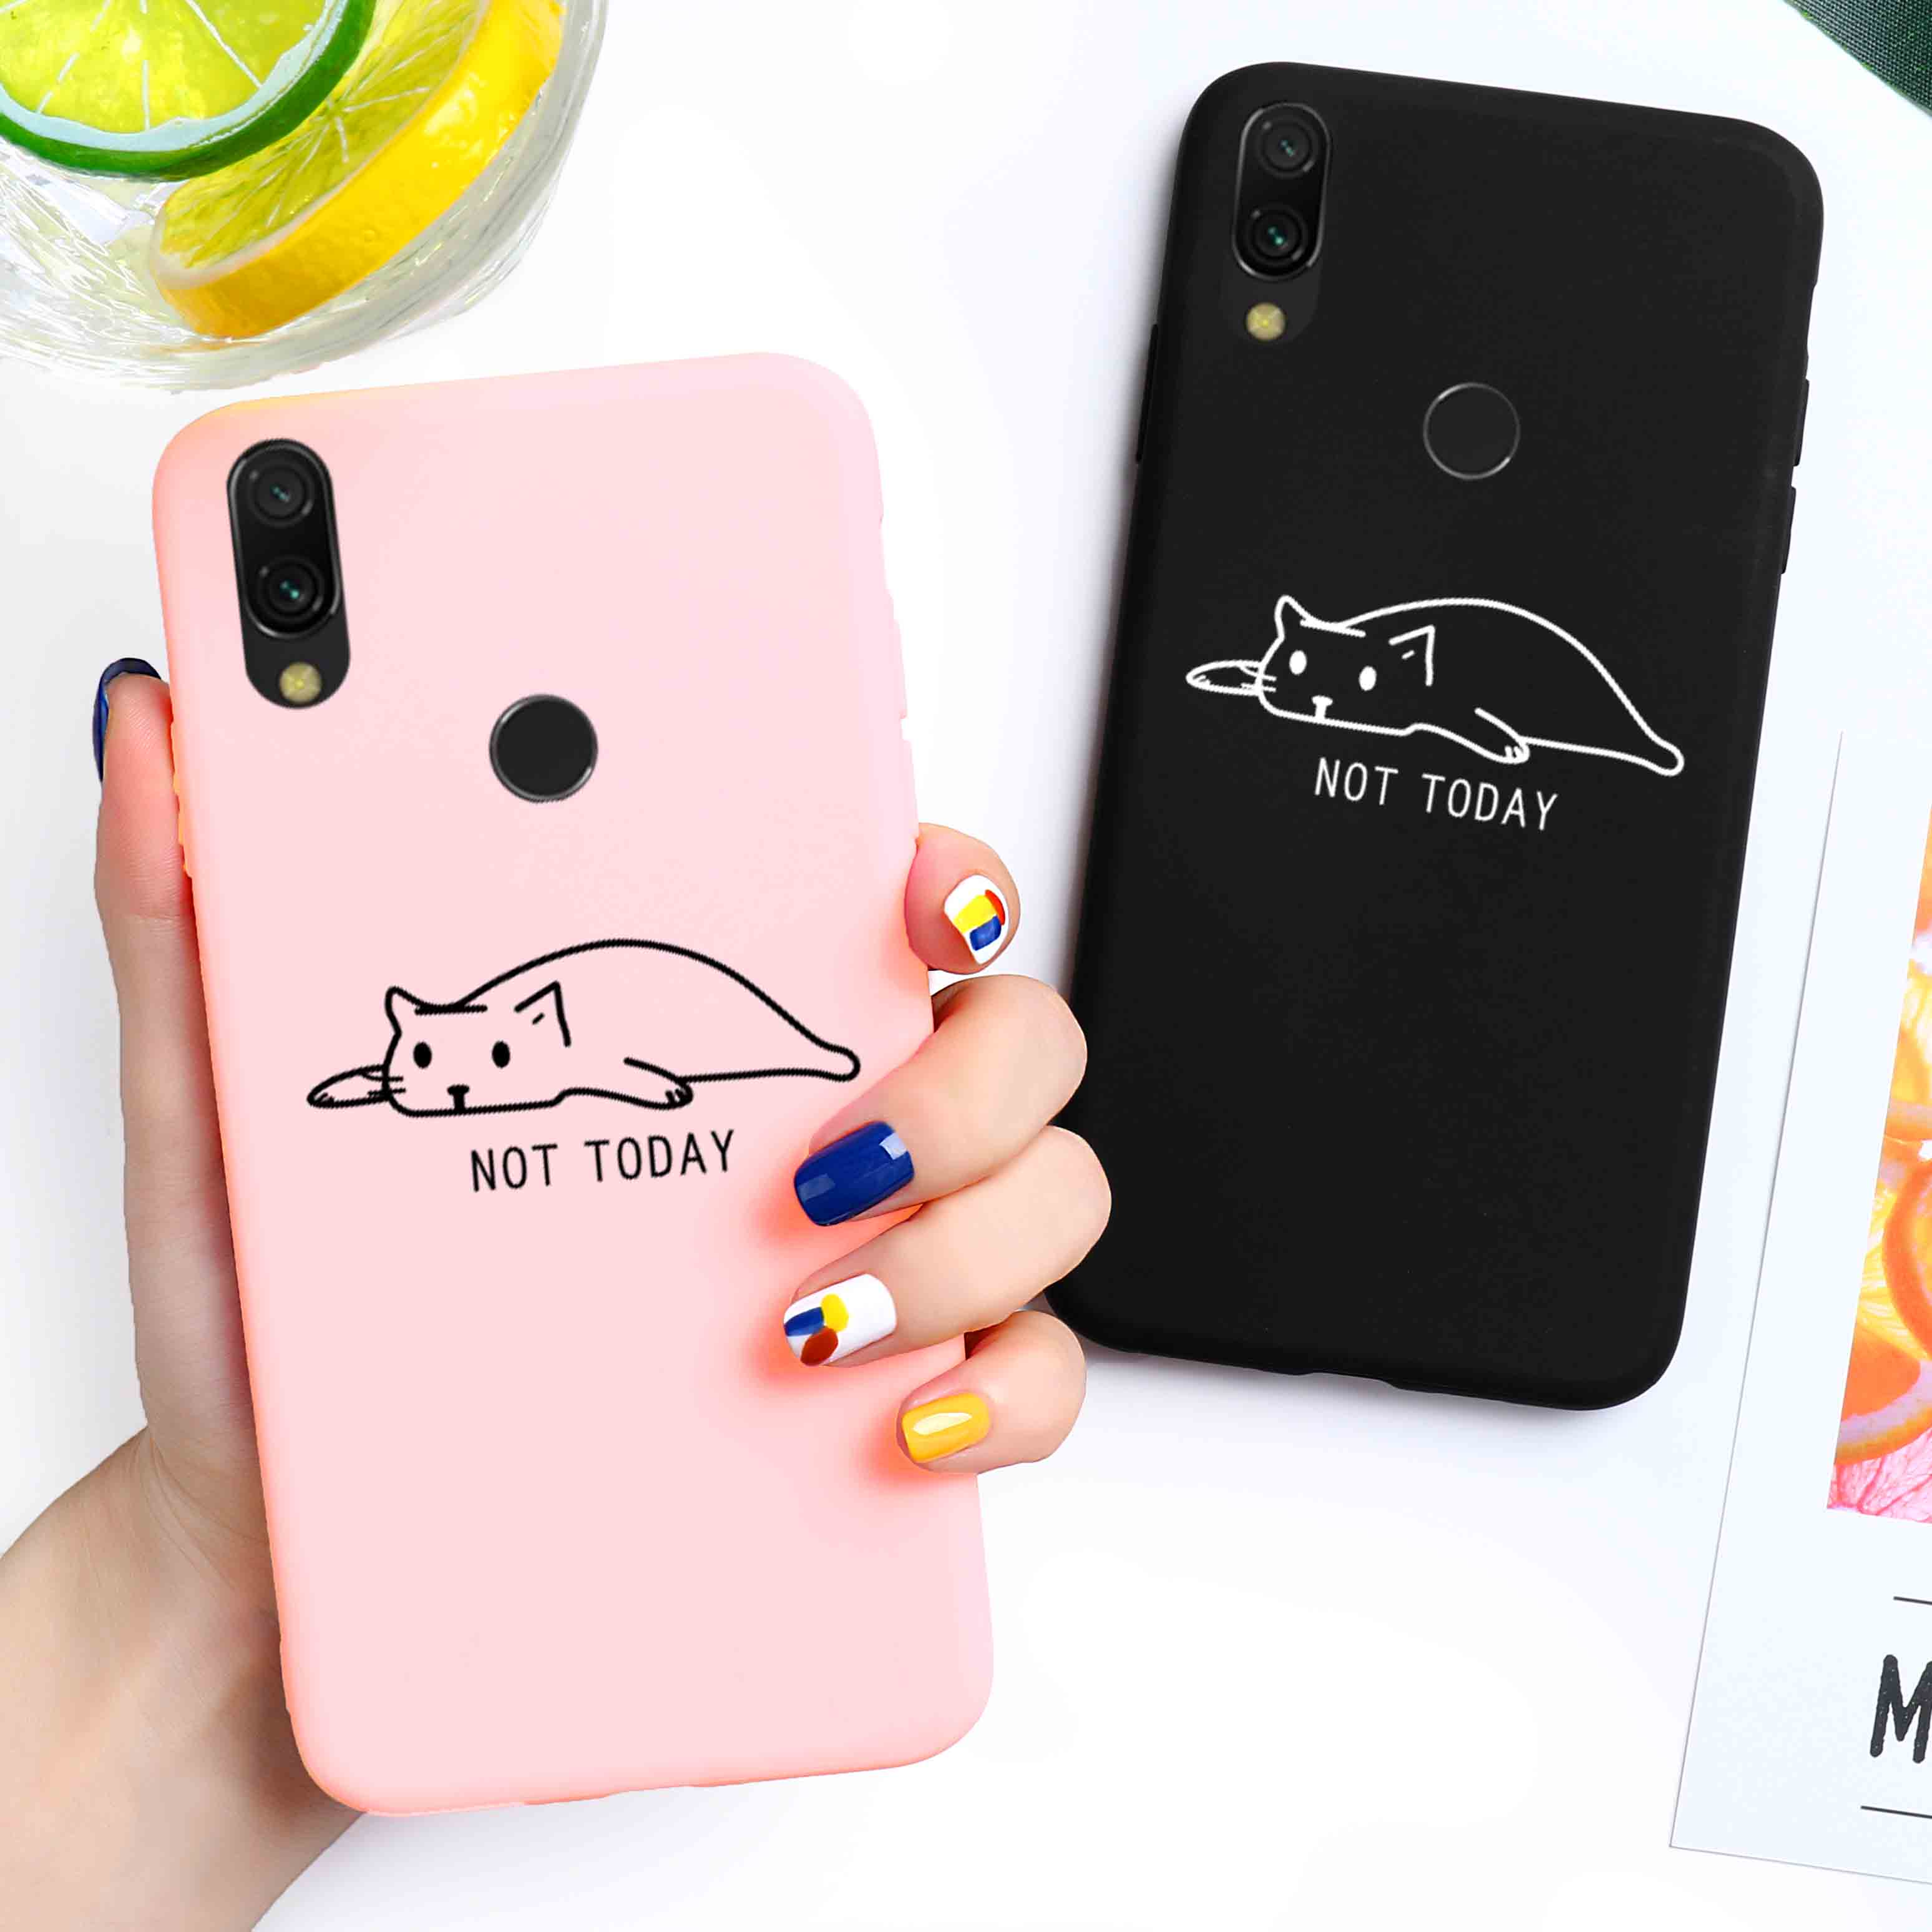 Candy Case For Xiaomi Redmi Note 8T Case Silicone 8 7 6 Pro 8A 7A 6A 5A 4X 5 Plus 6 7 8 S2 Y2 K30 K20 Pro Go Cute Cat Cover